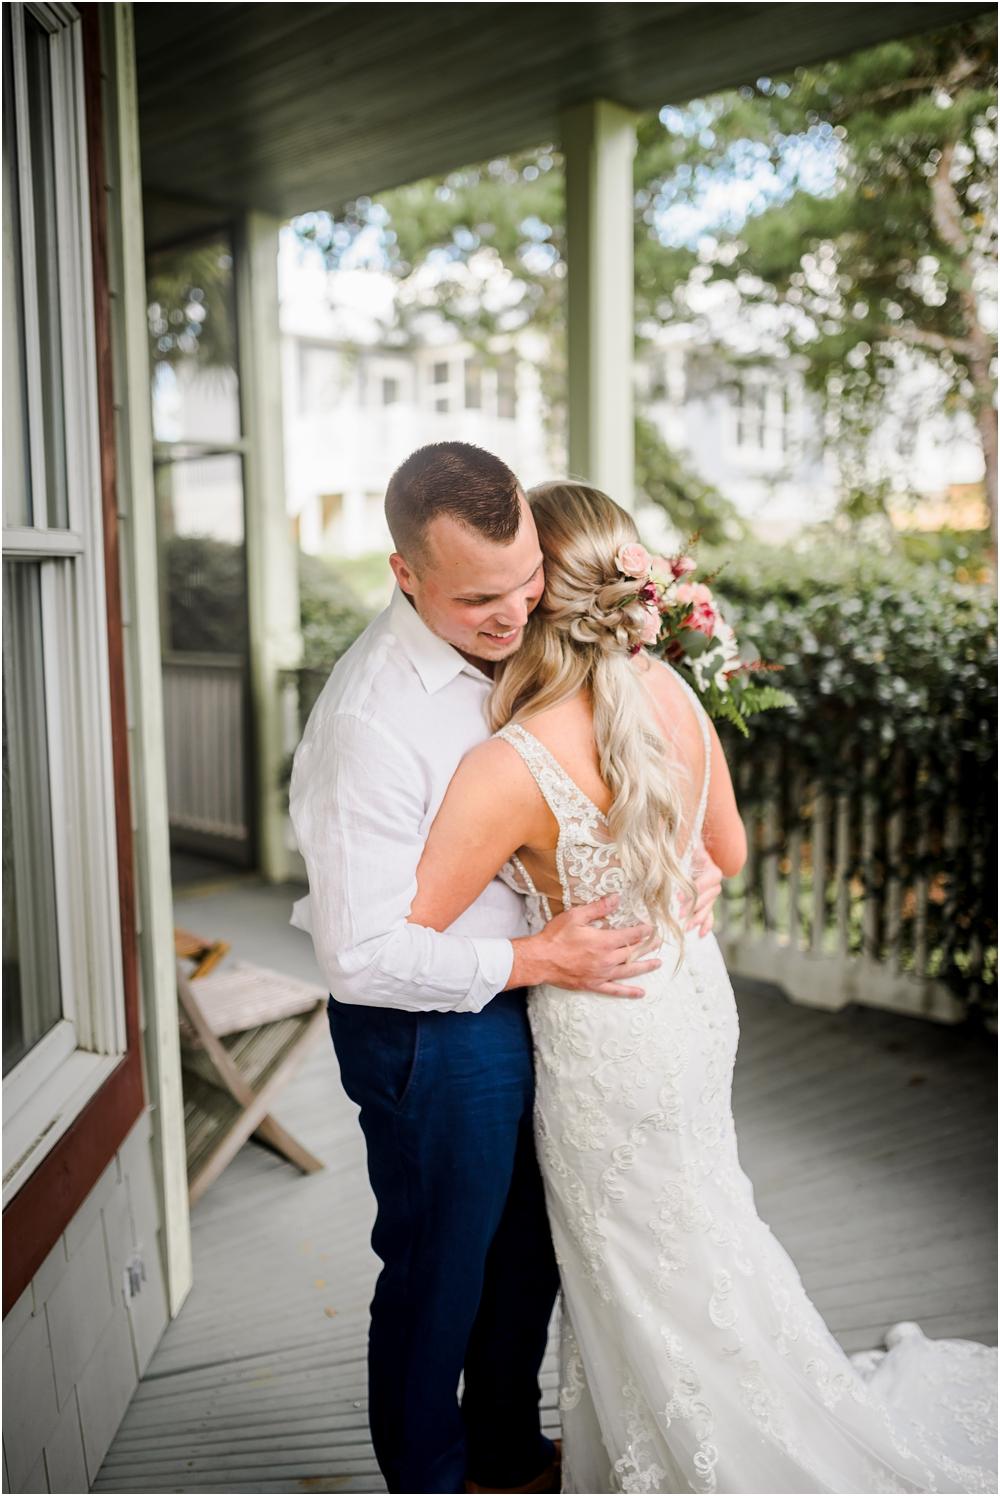 mcglothlin-wedding-kiersten-stevenson-photography-30a-panama-city-beach-dothan-tallahassee-(52-of-145).jpg